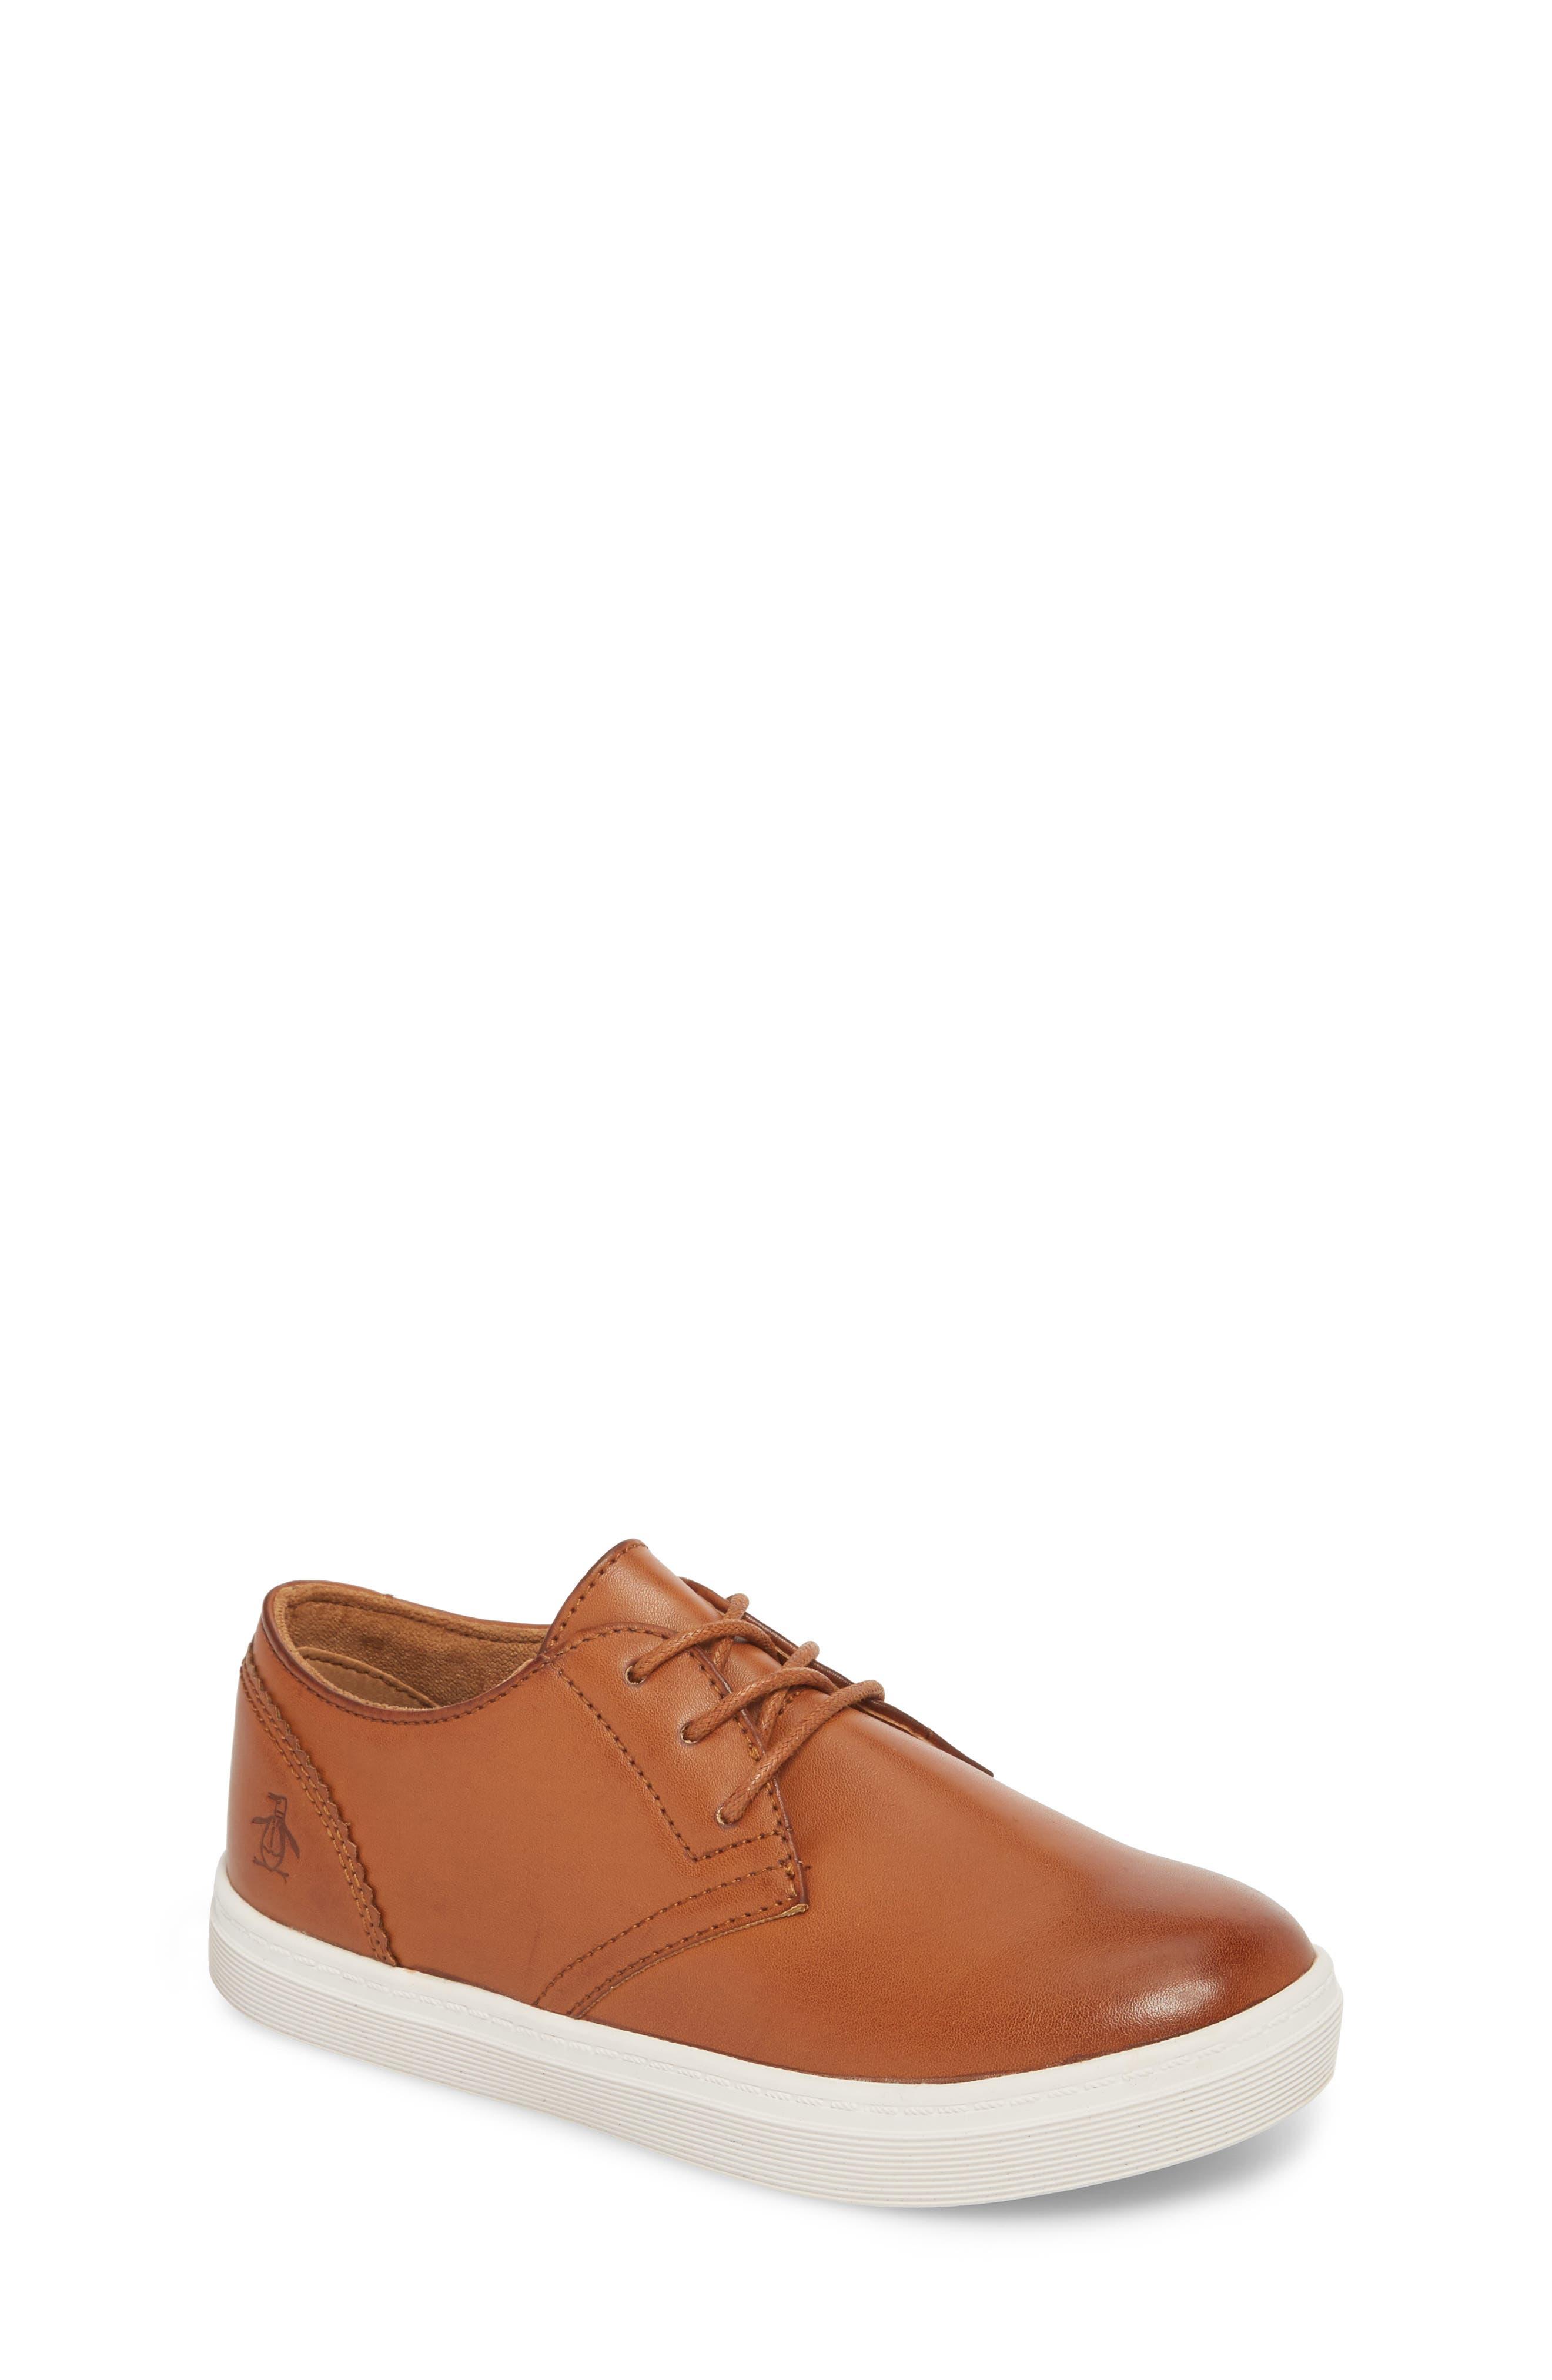 Freeland Sneaker,                             Main thumbnail 1, color,                             COGNAC